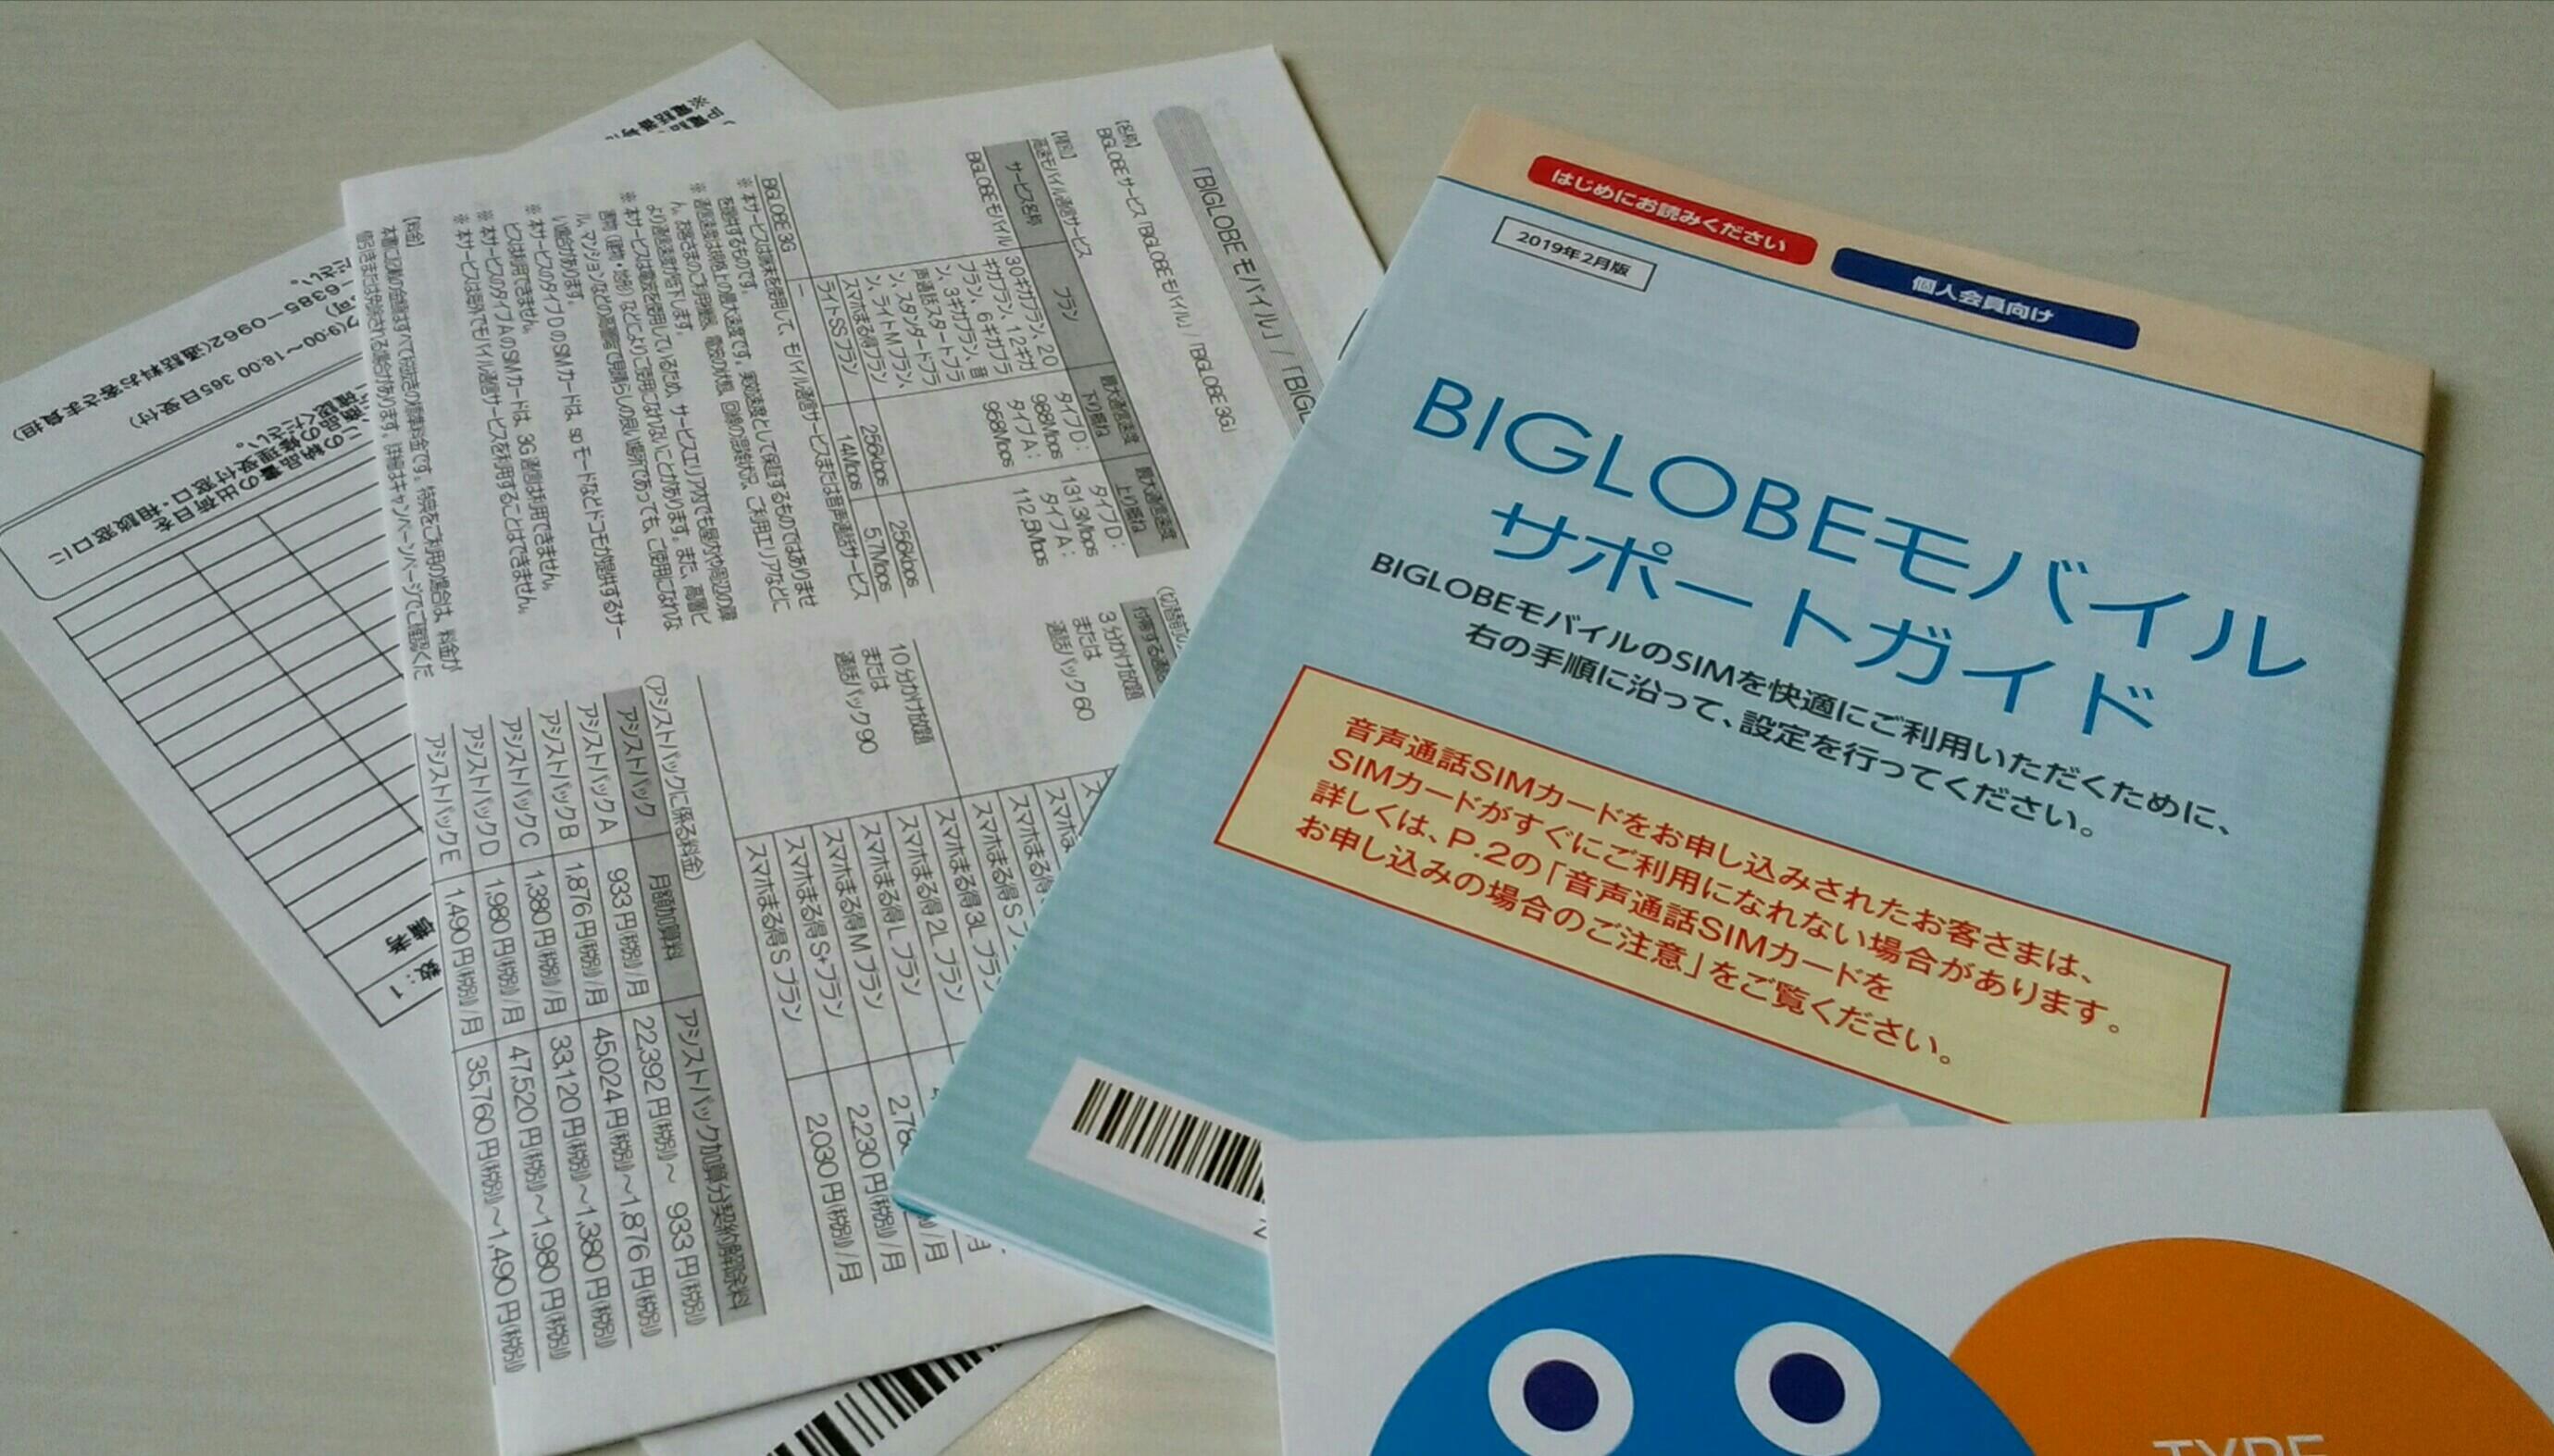 BIGLOBE mobile